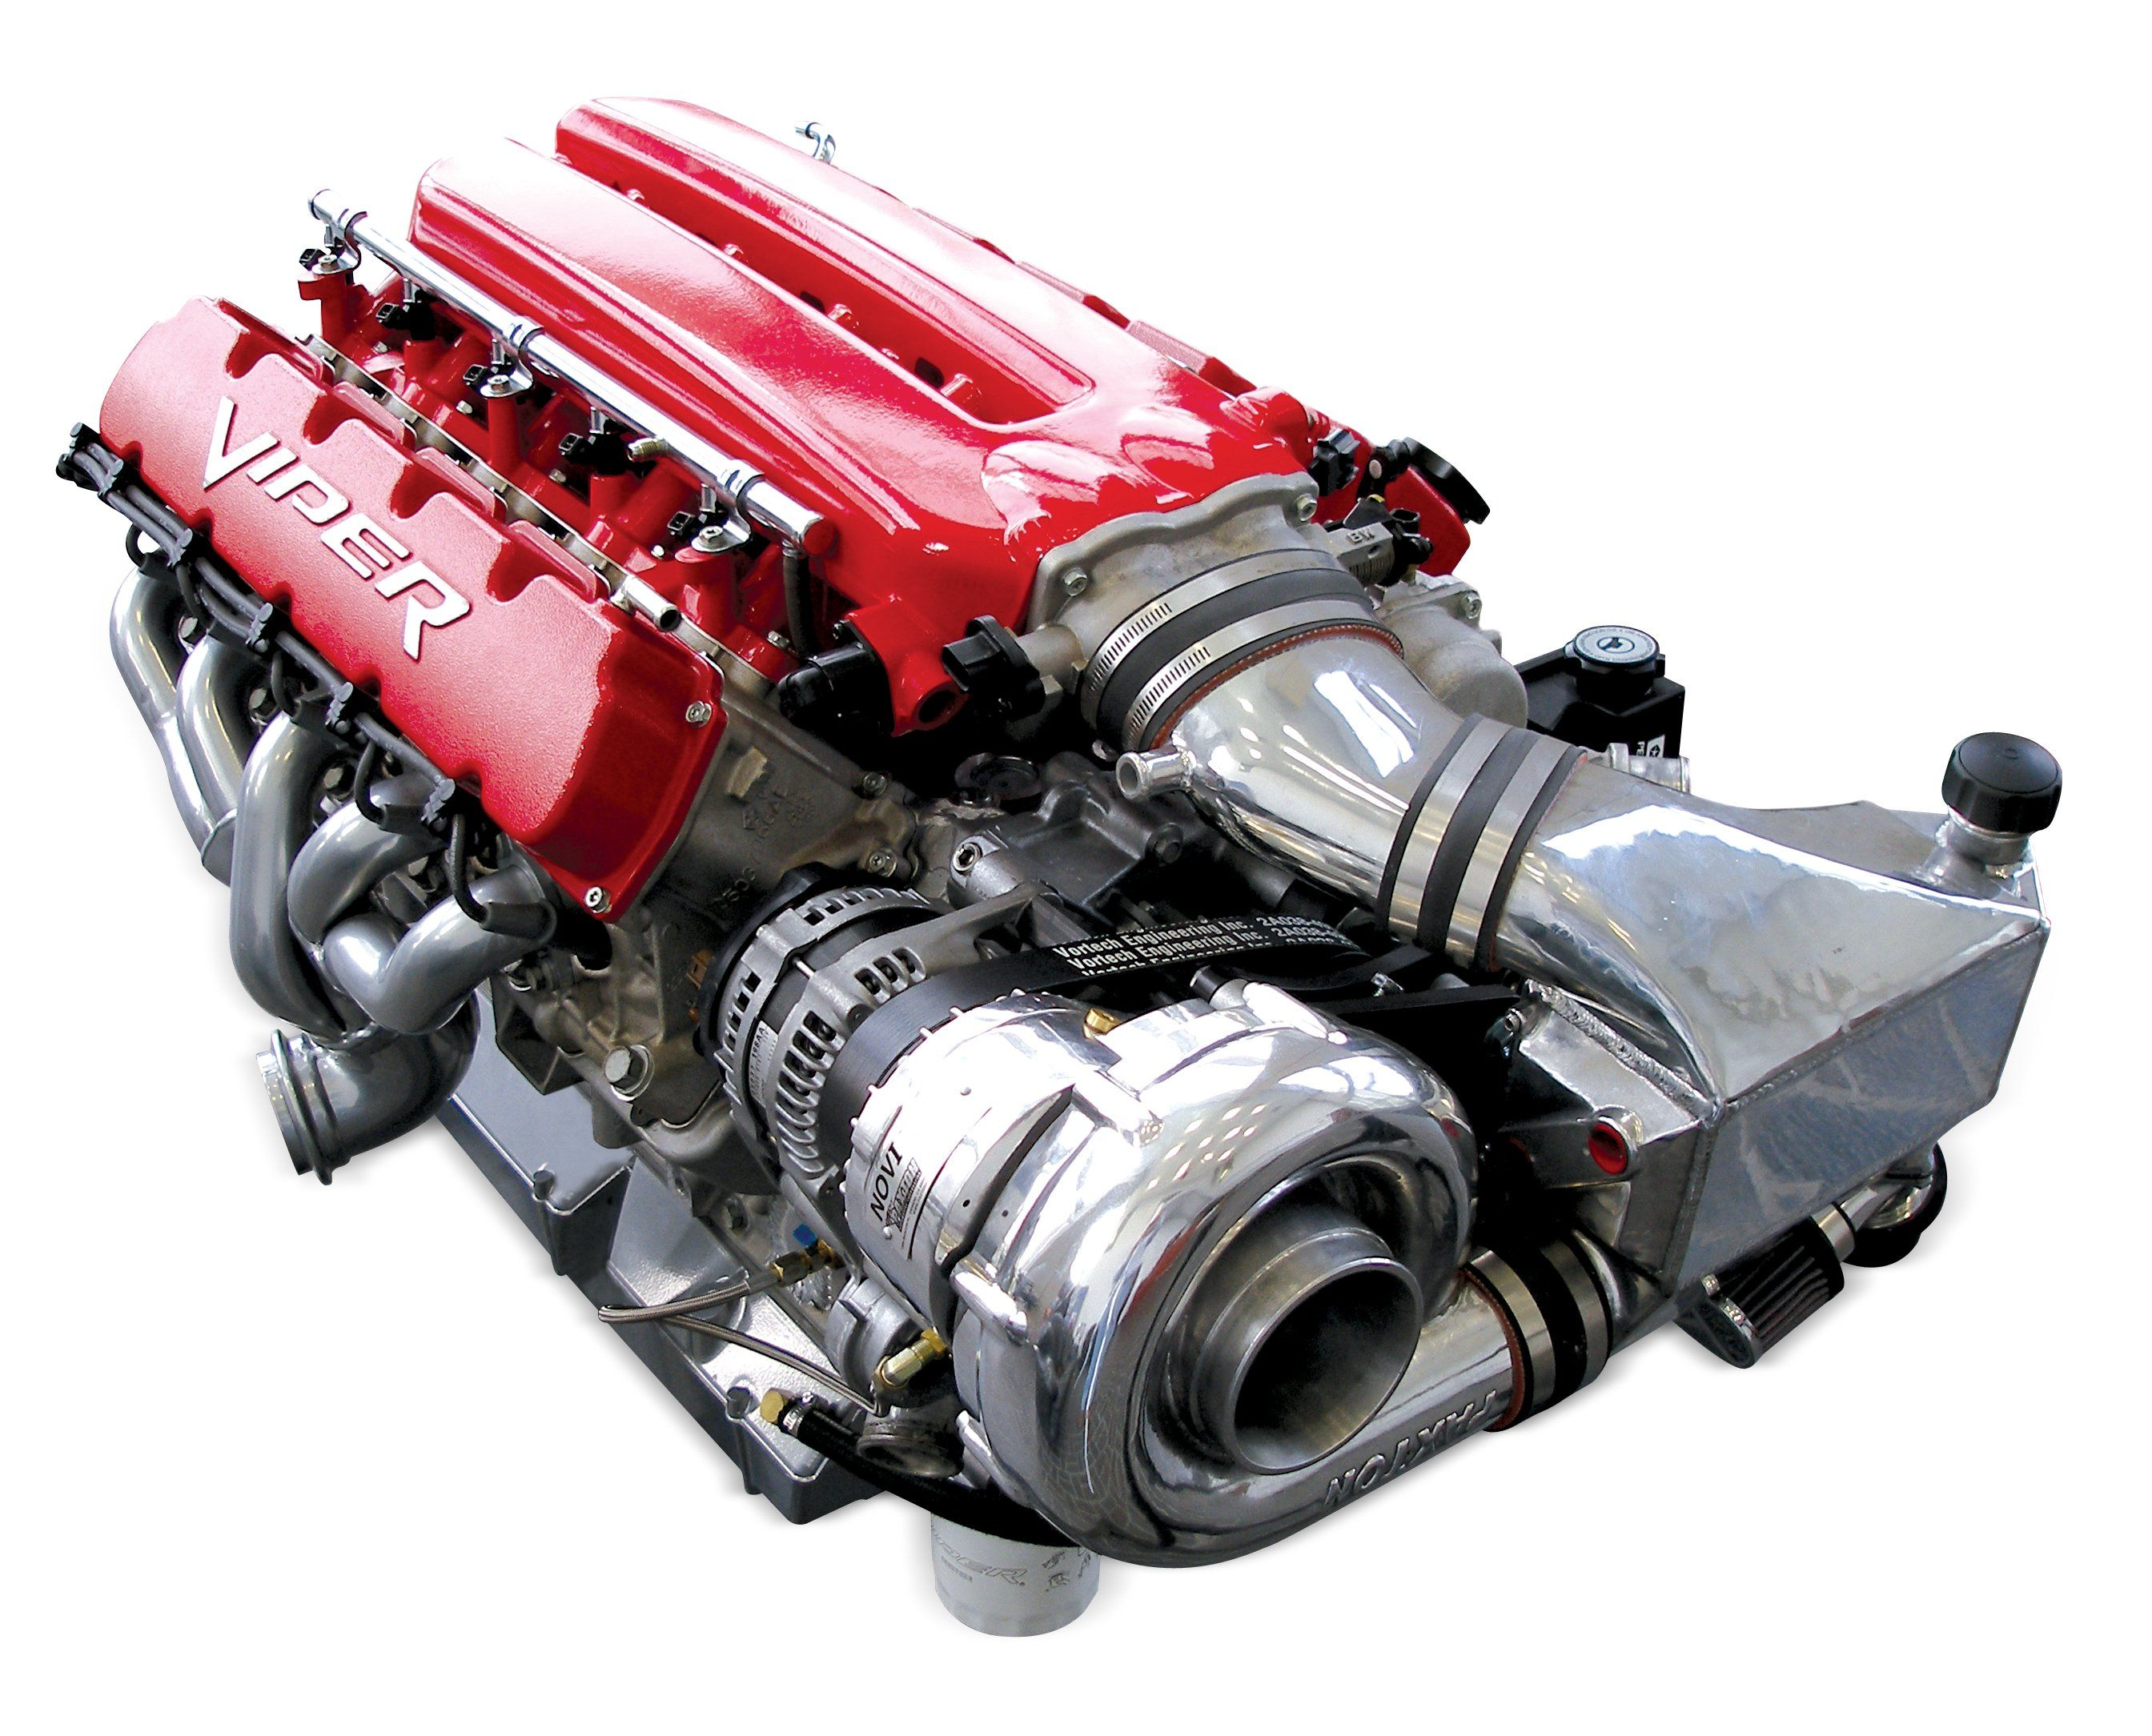 2003-2006 Dodge Viper SRT-10 Supercharger System | Paxton